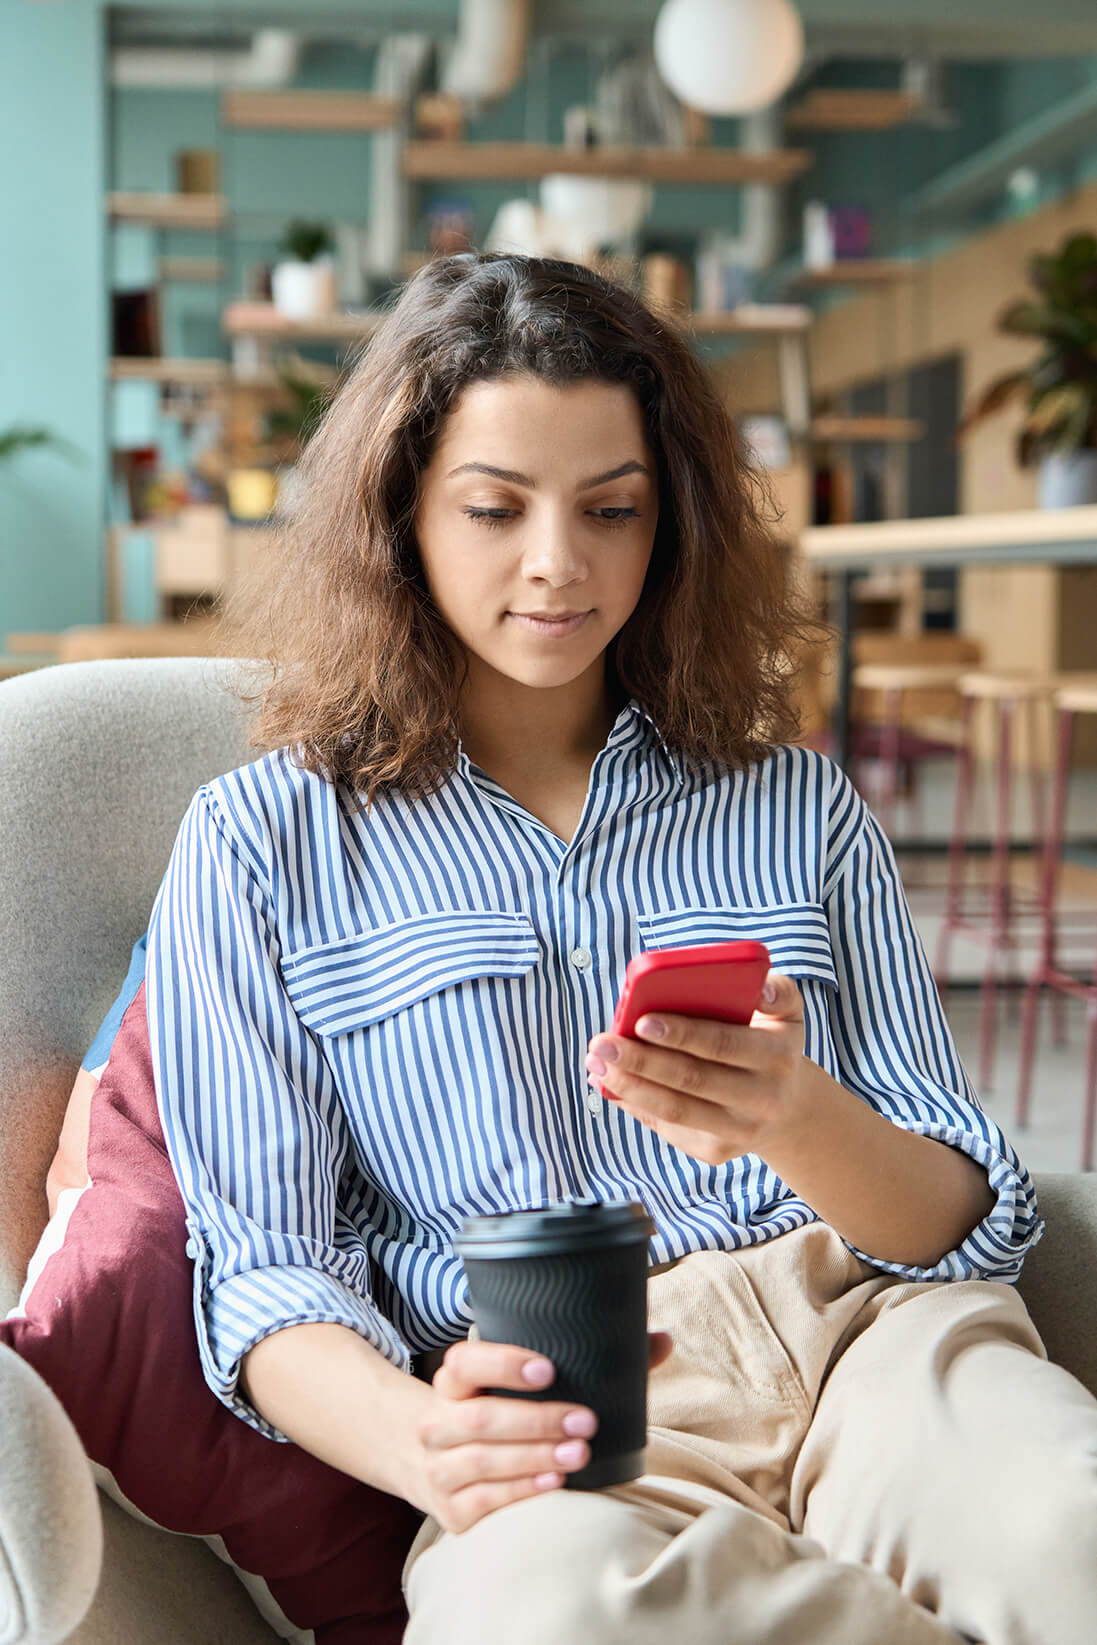 latin-teenager-girl-sitting-using-smartphone-app-l-FVBXU3Y (1).jpg